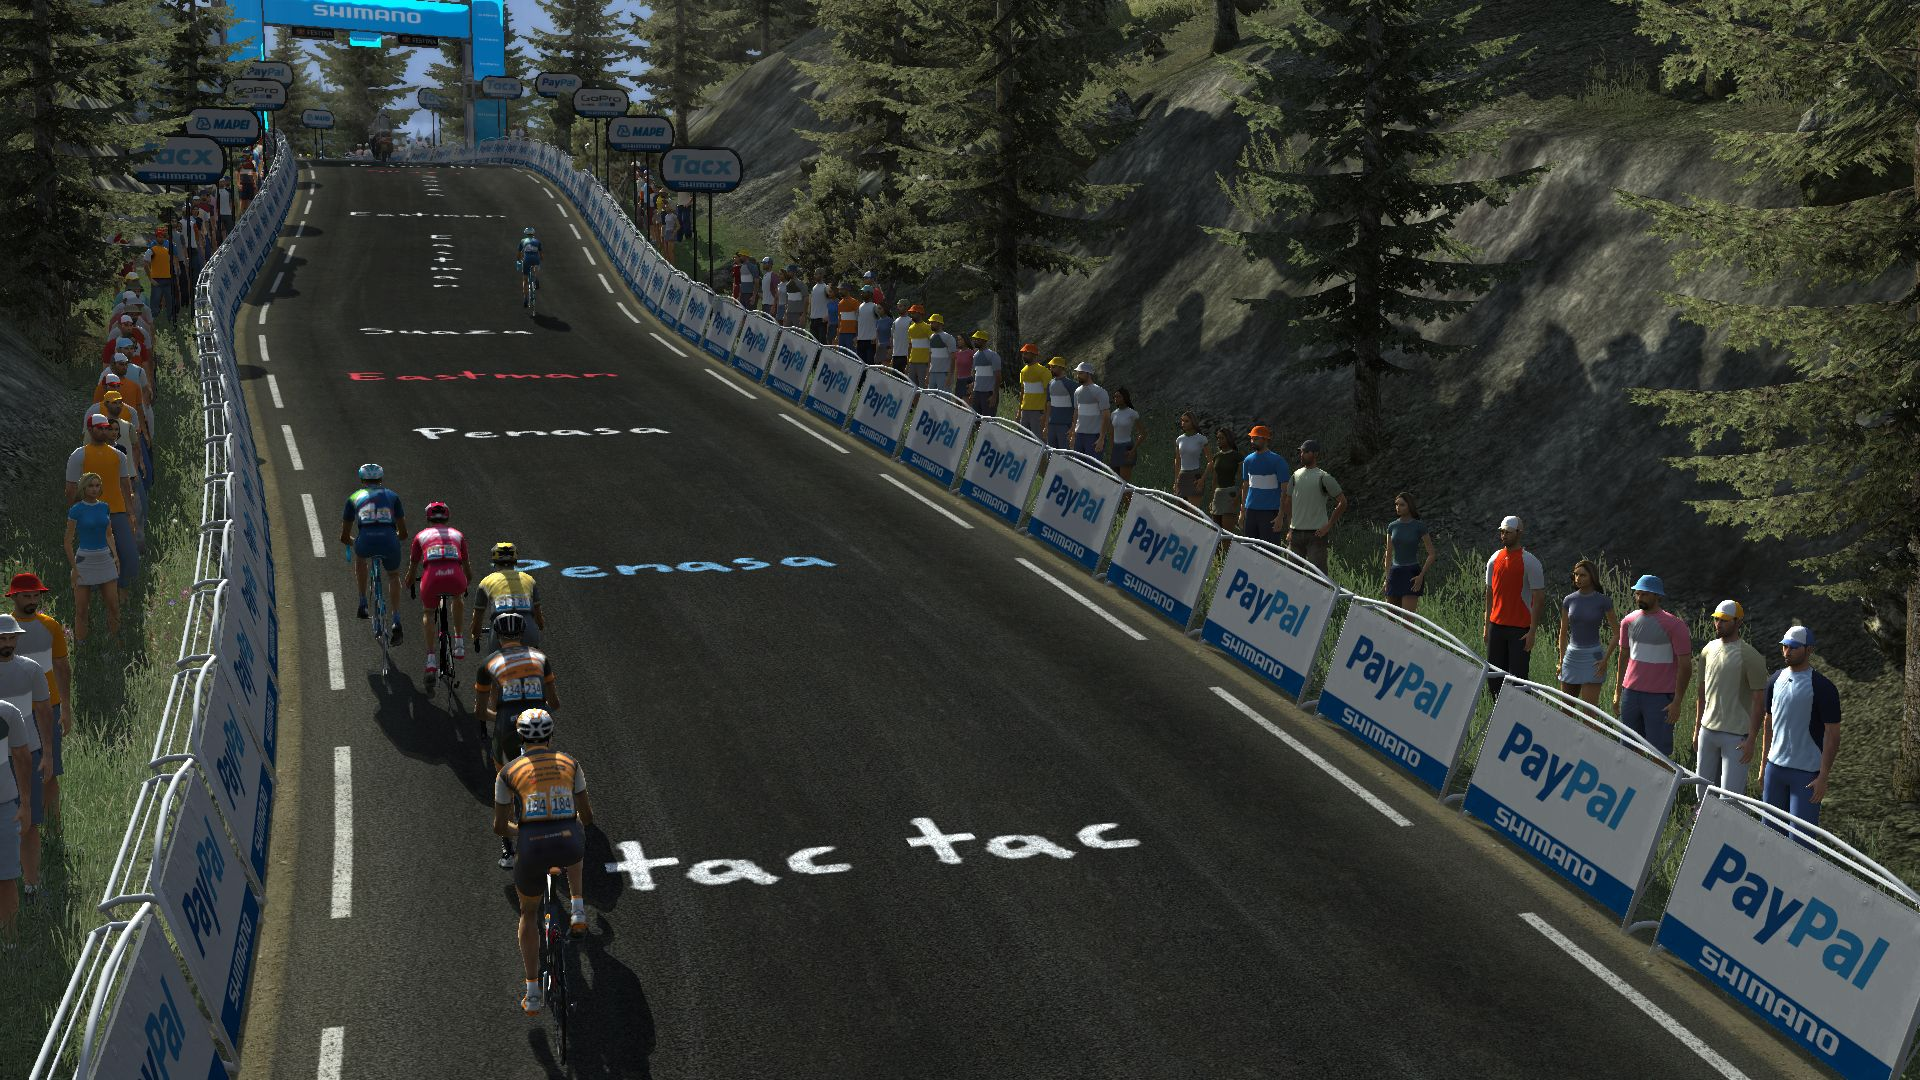 pcmdaily.com/images/mg/2017/Races/CT/Trentino/mg2017_trentino_04_PCM0157.jpg